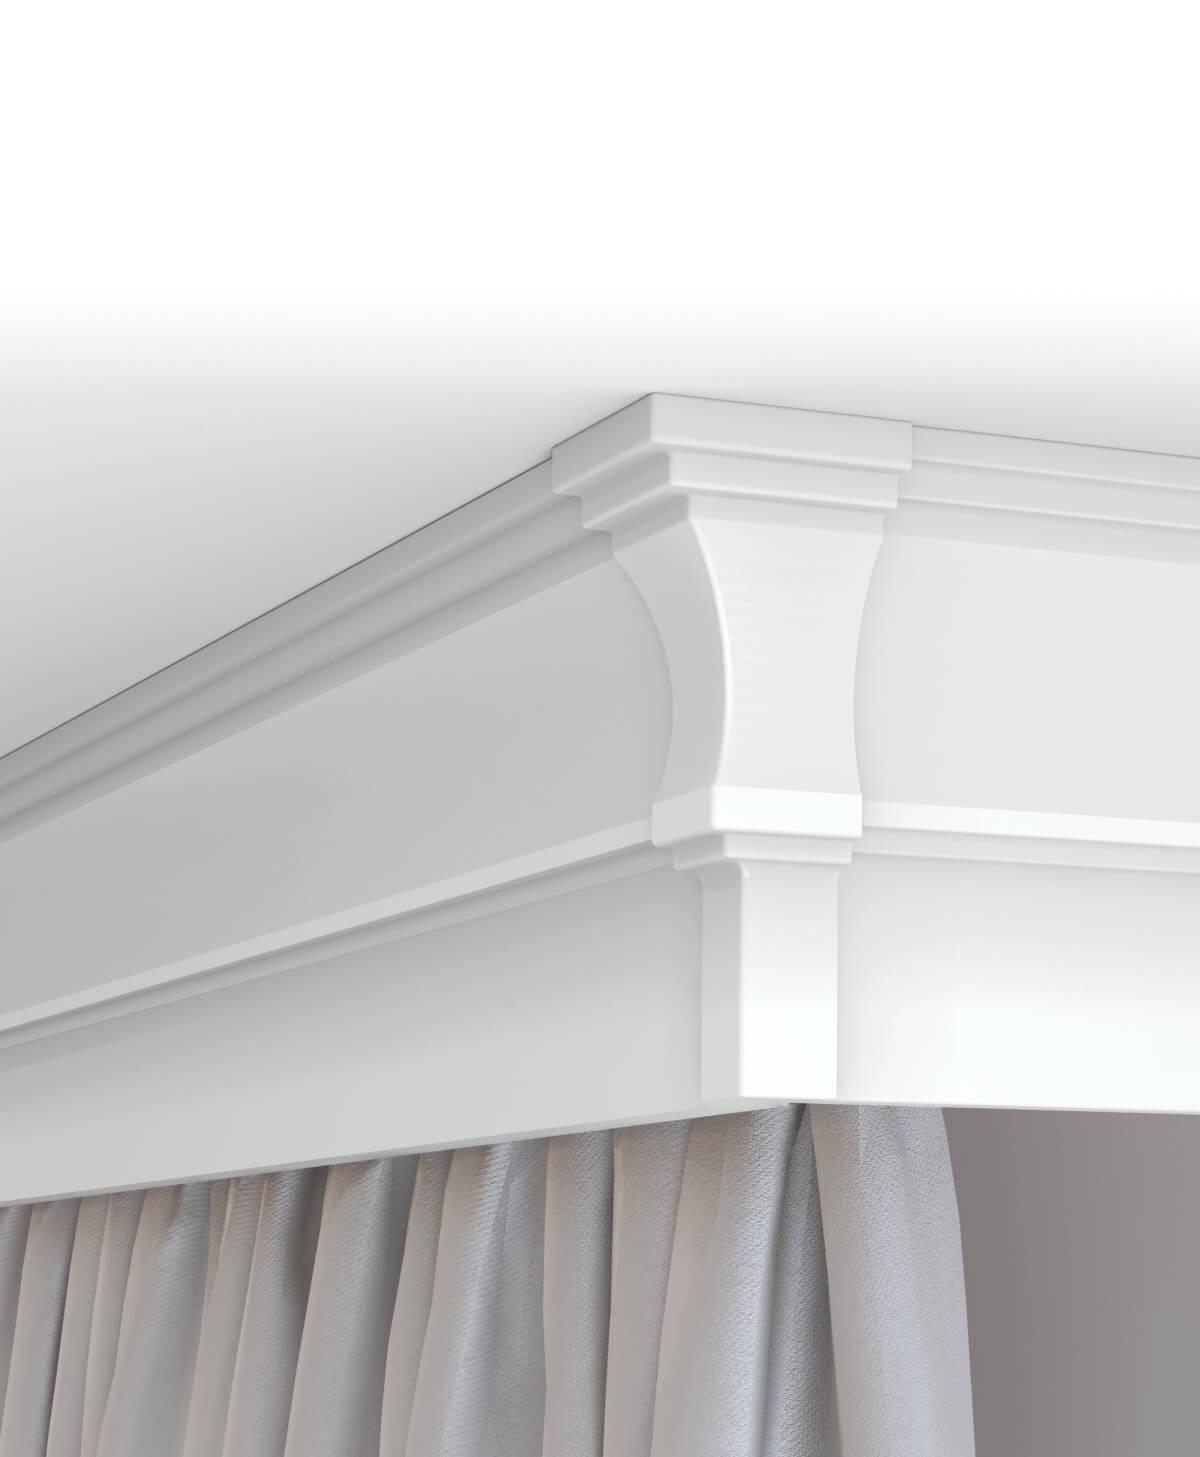 Slimflex dekoratif kapak 2